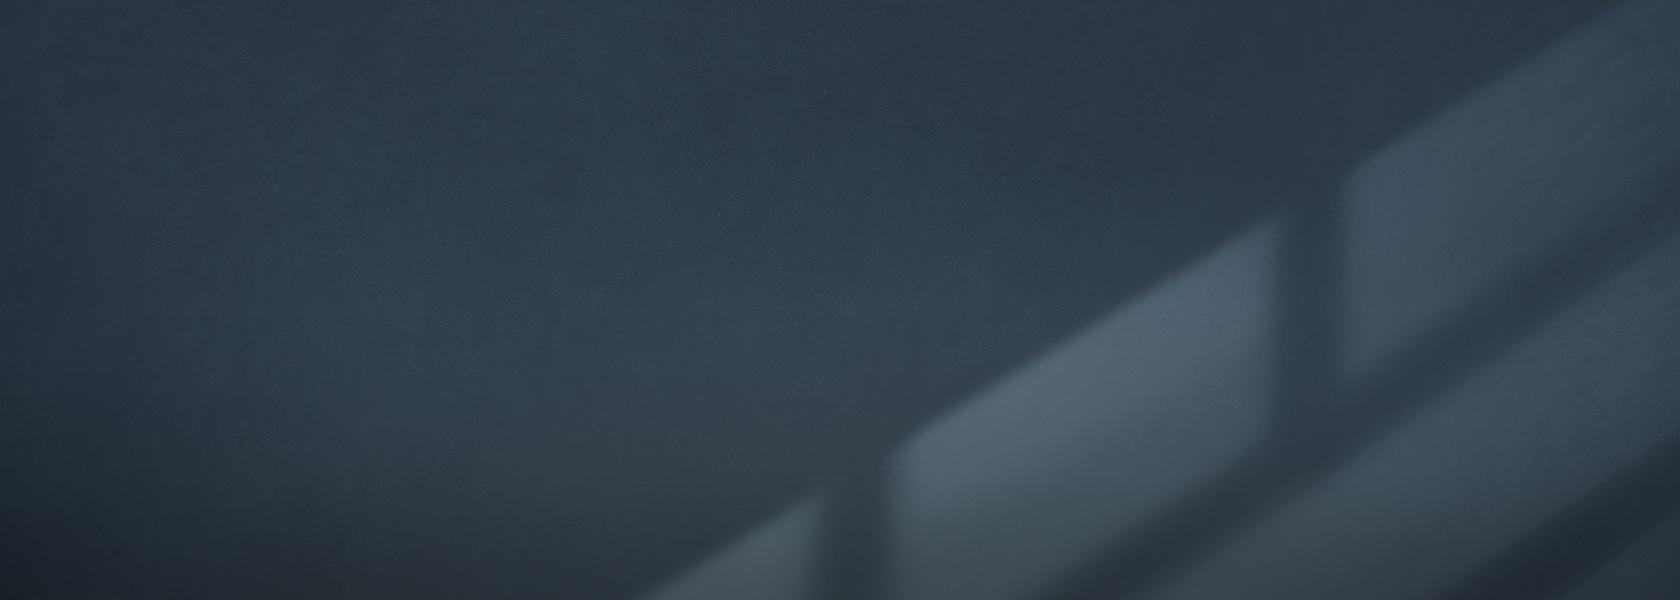 background image for branding agency